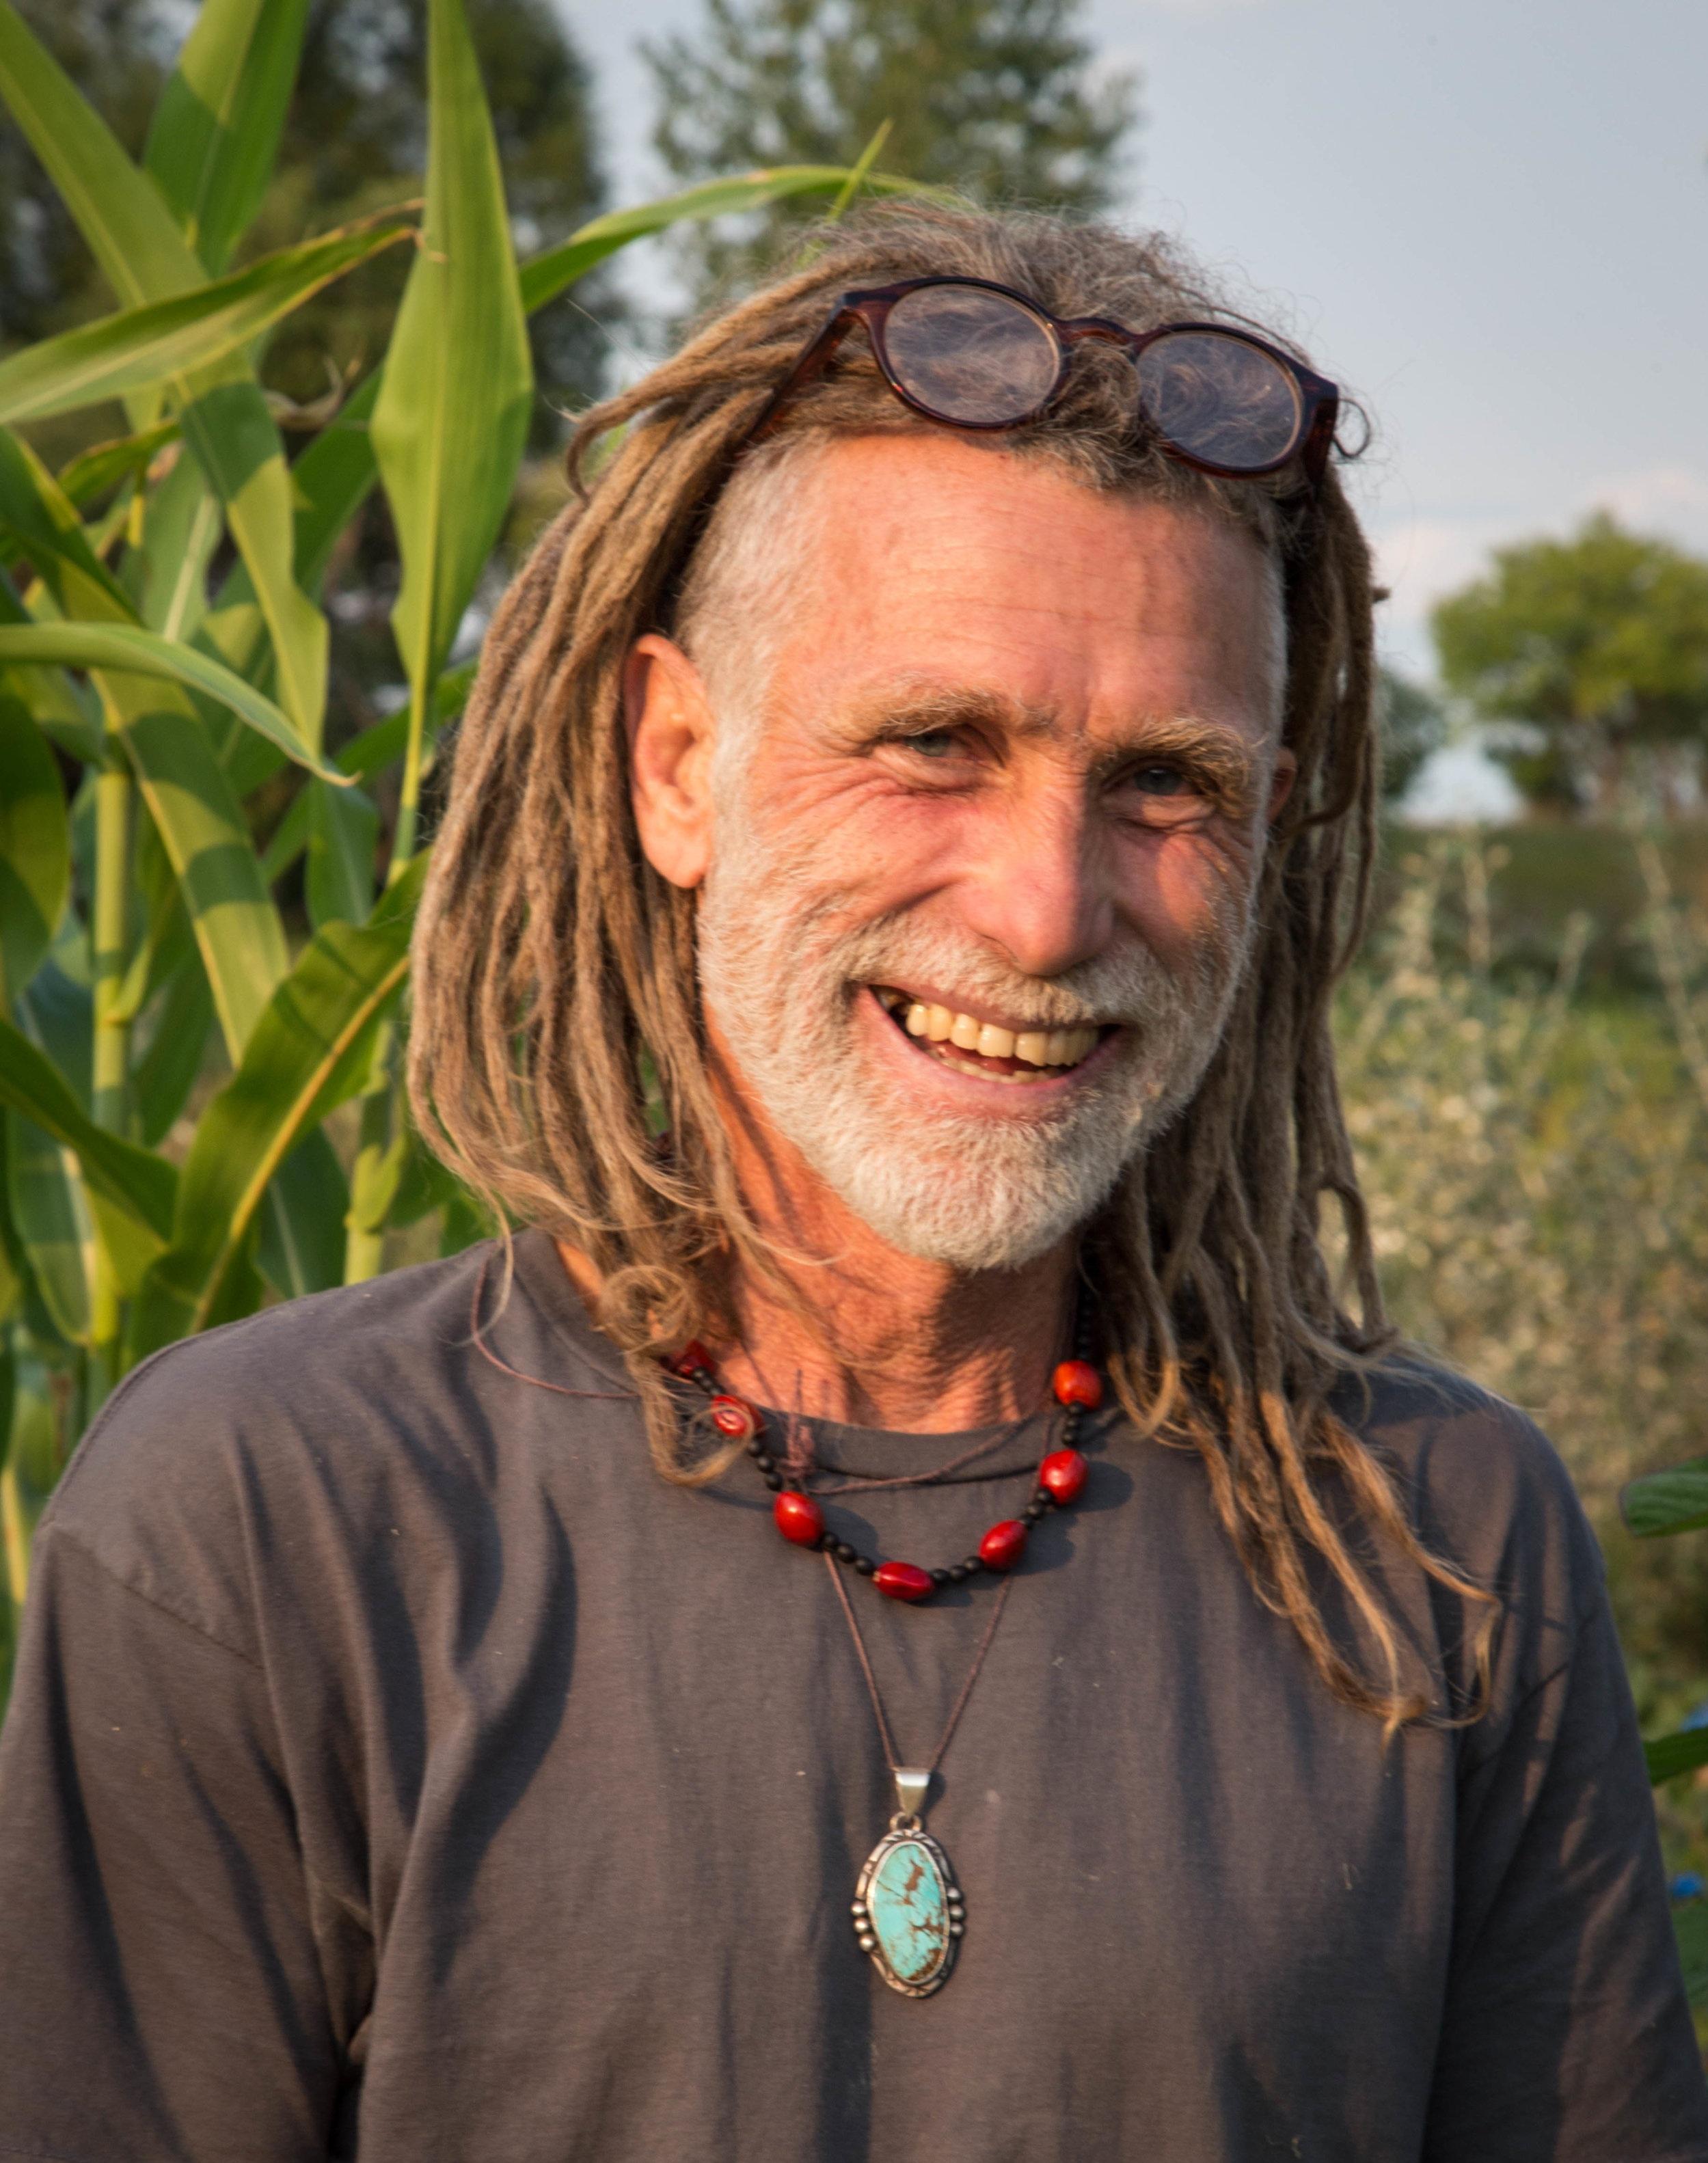 RICHARD PECORARO - Founder, Master Seedsman & Head Farmer